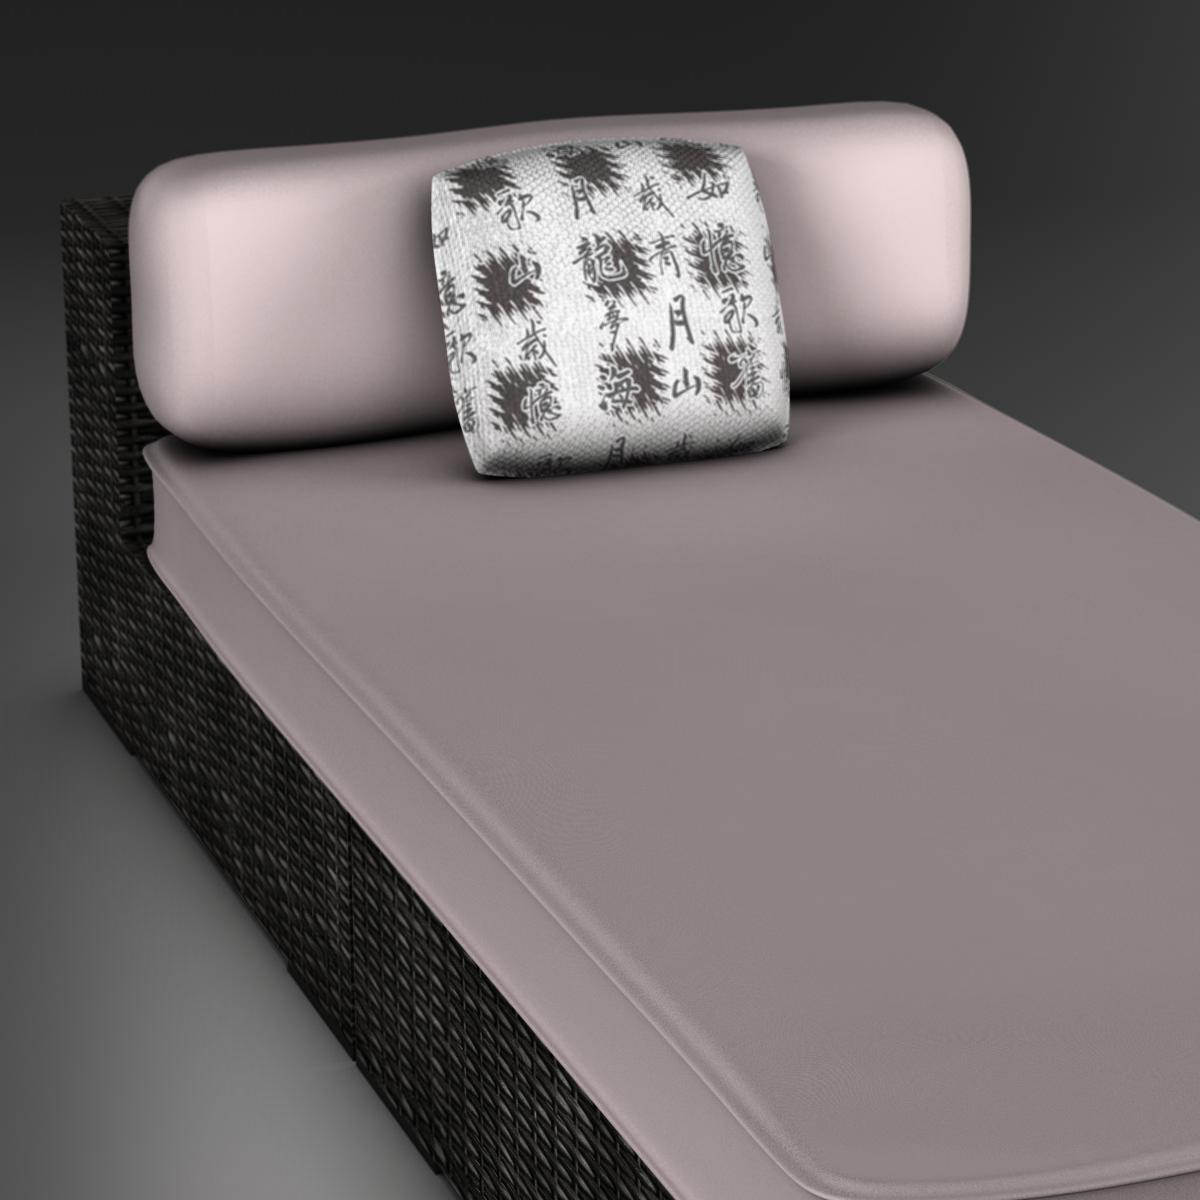 rattan chaise 3d загвар 3ds max fbx c4d ma mb obj 162562